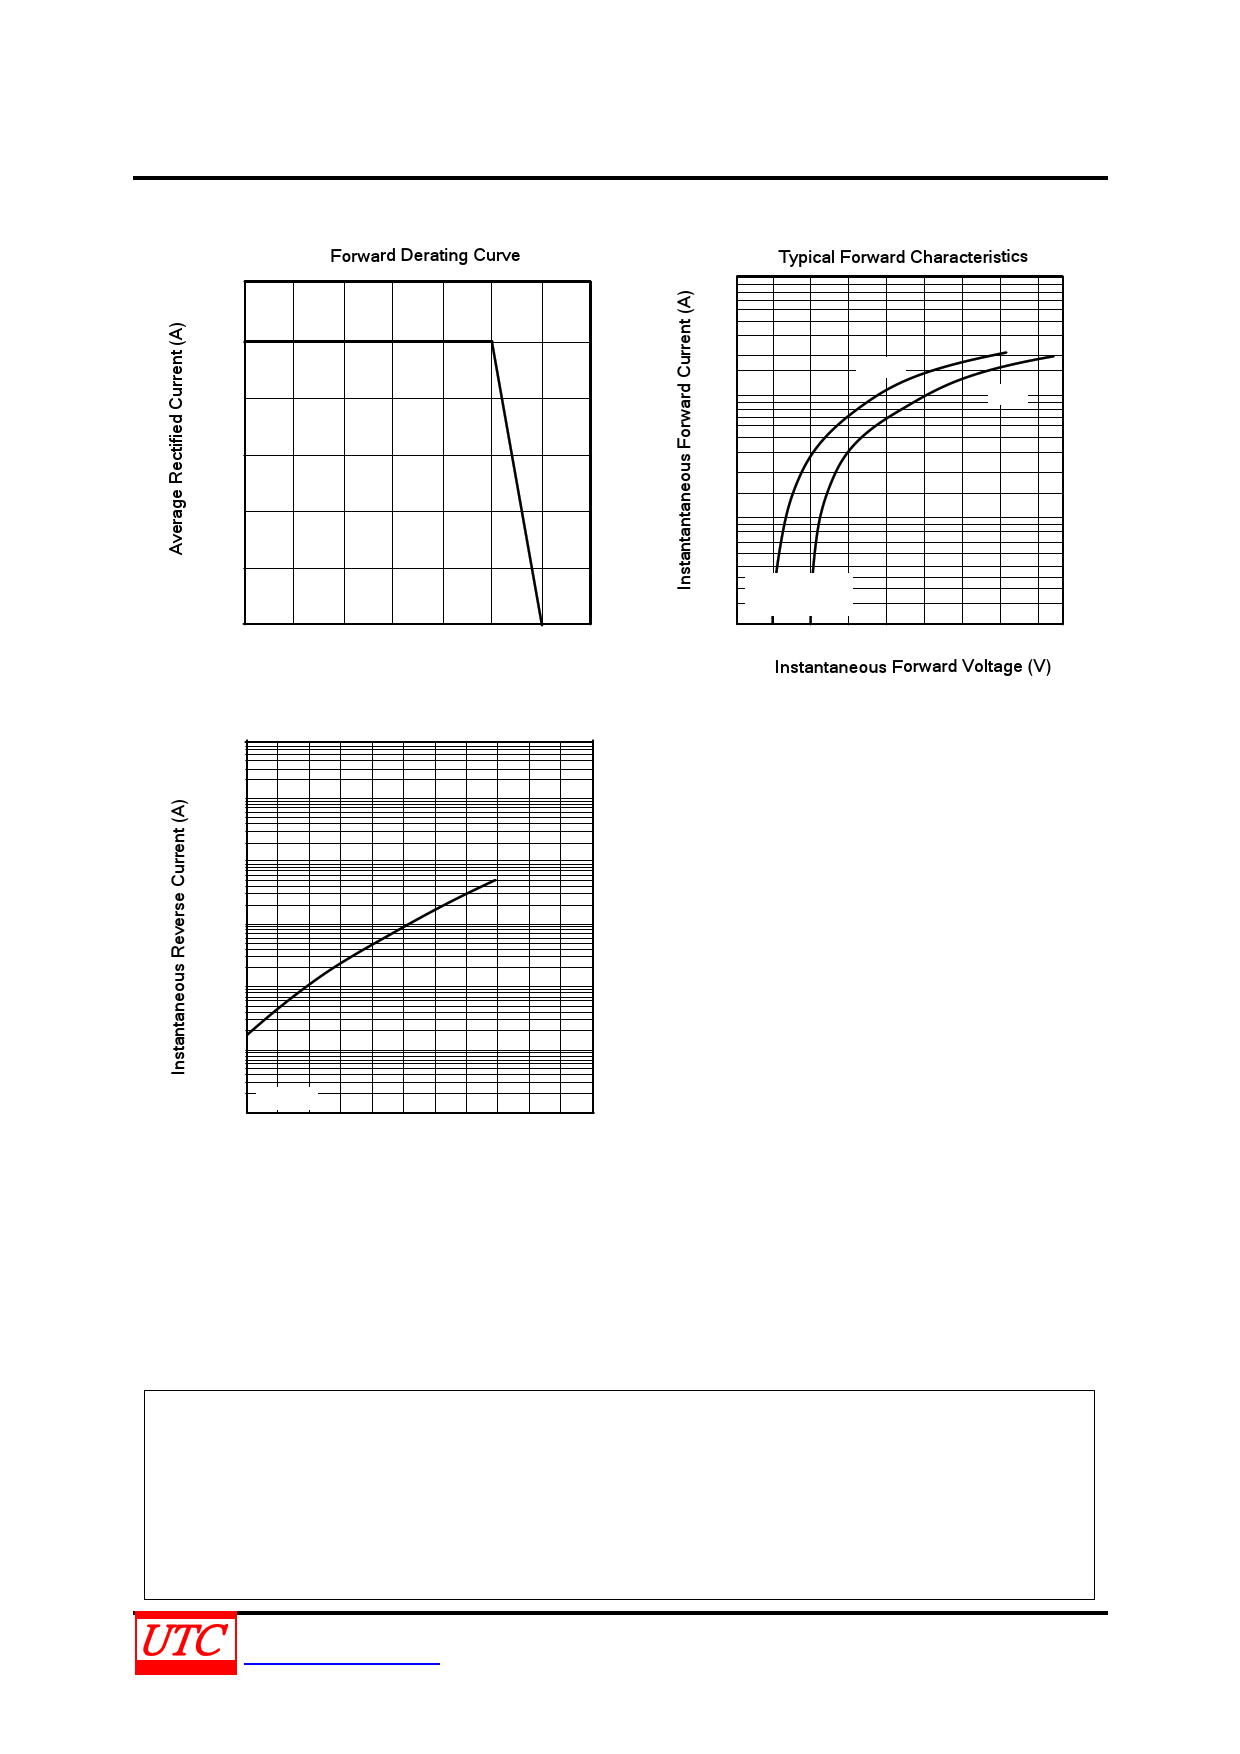 MGBR20L60CG-TND-T pdf, 반도체, 판매, 대치품